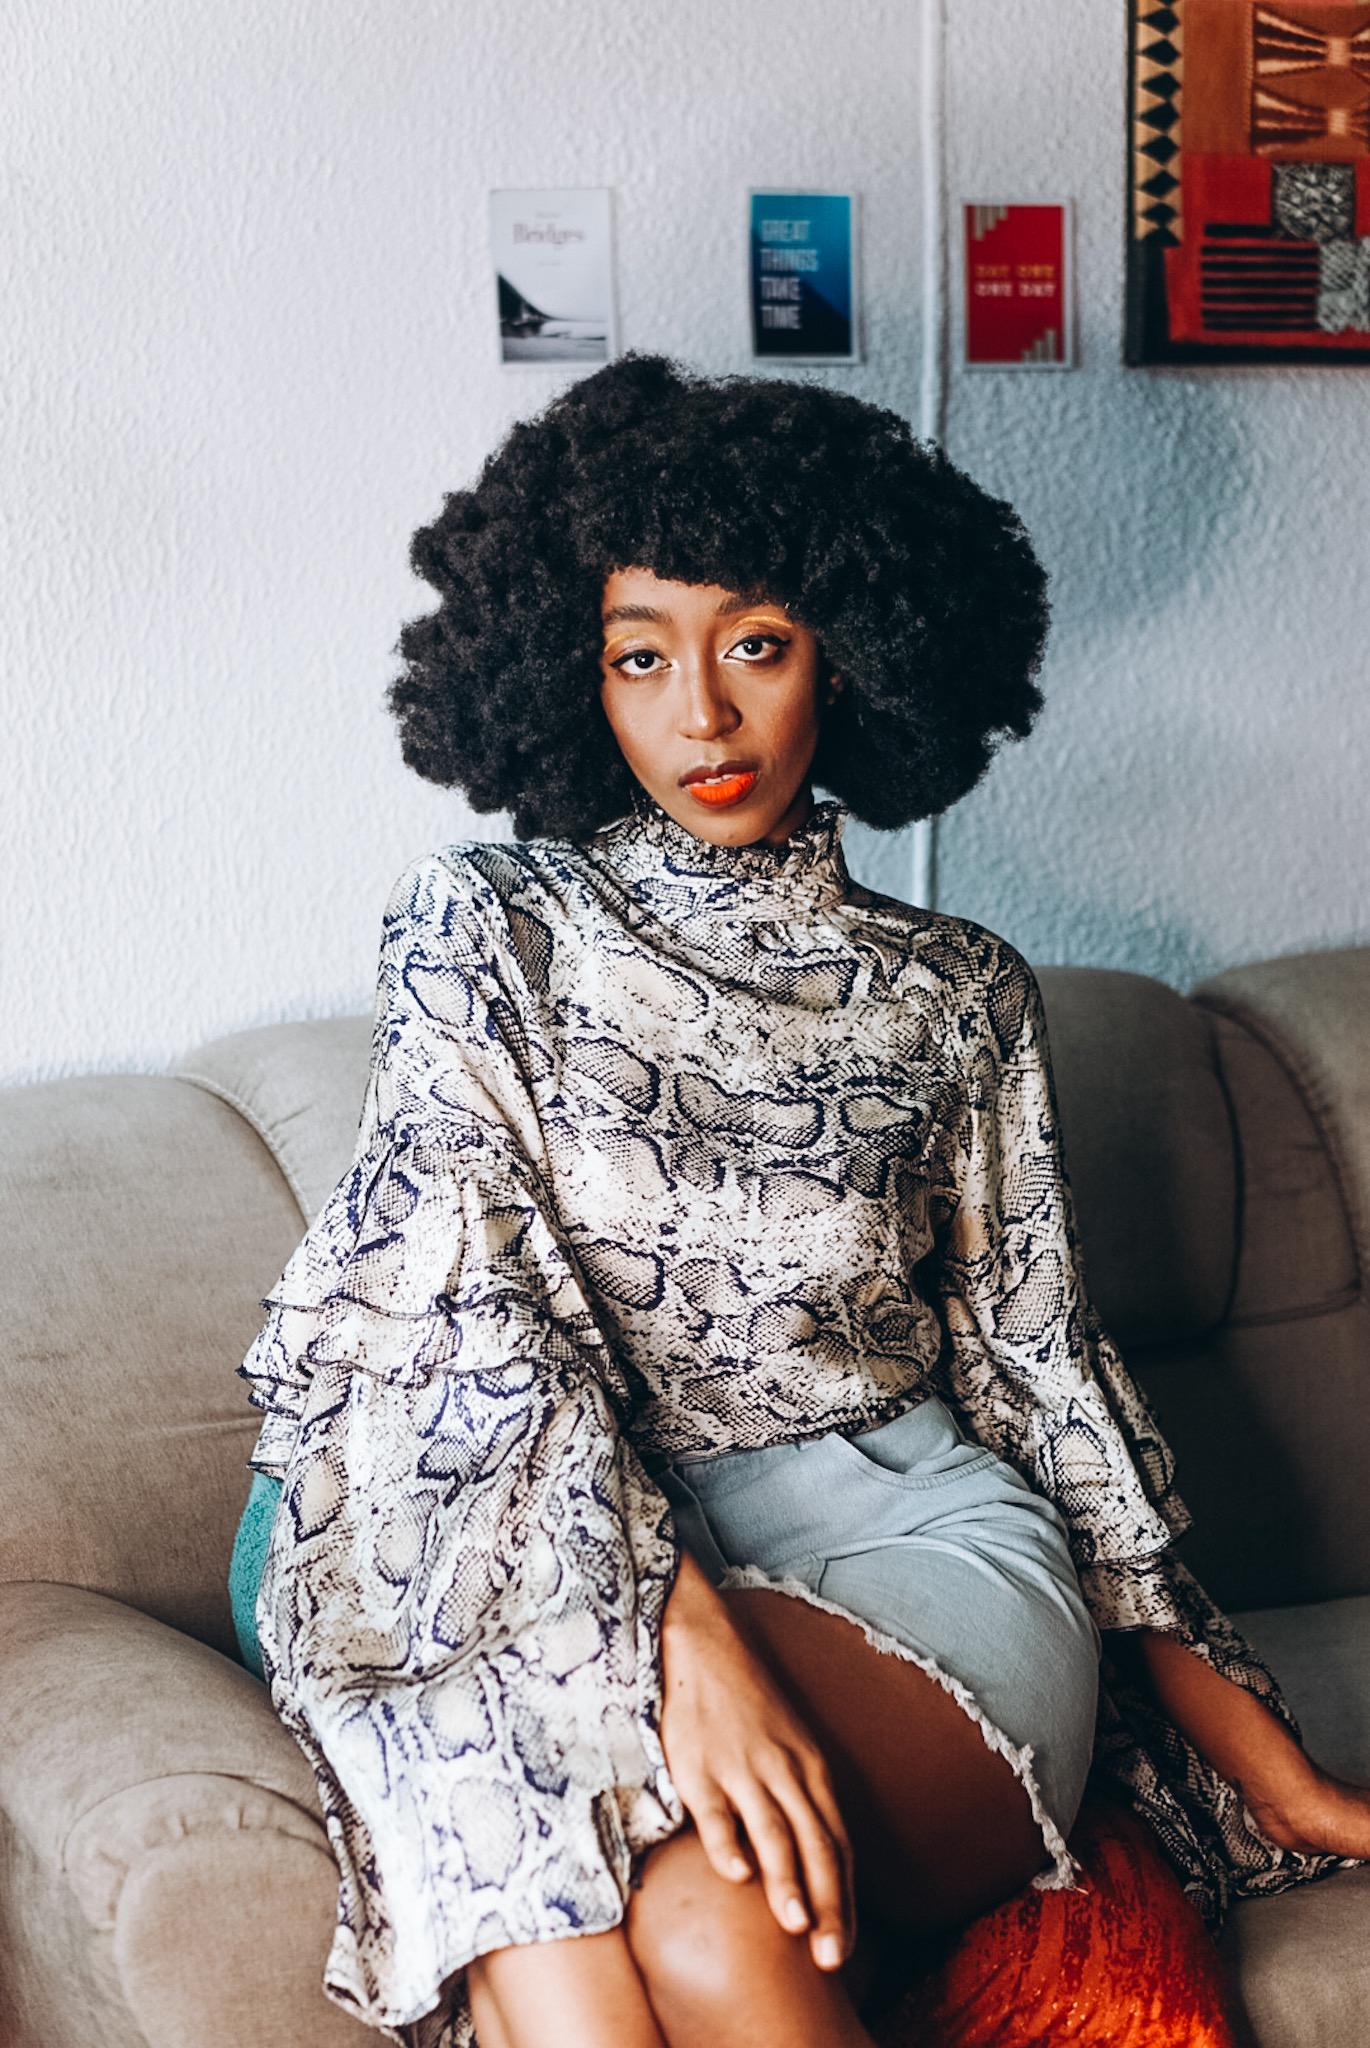 Nigerian style blogger Cassie Daves in a high neck shirt by Designer Rekana